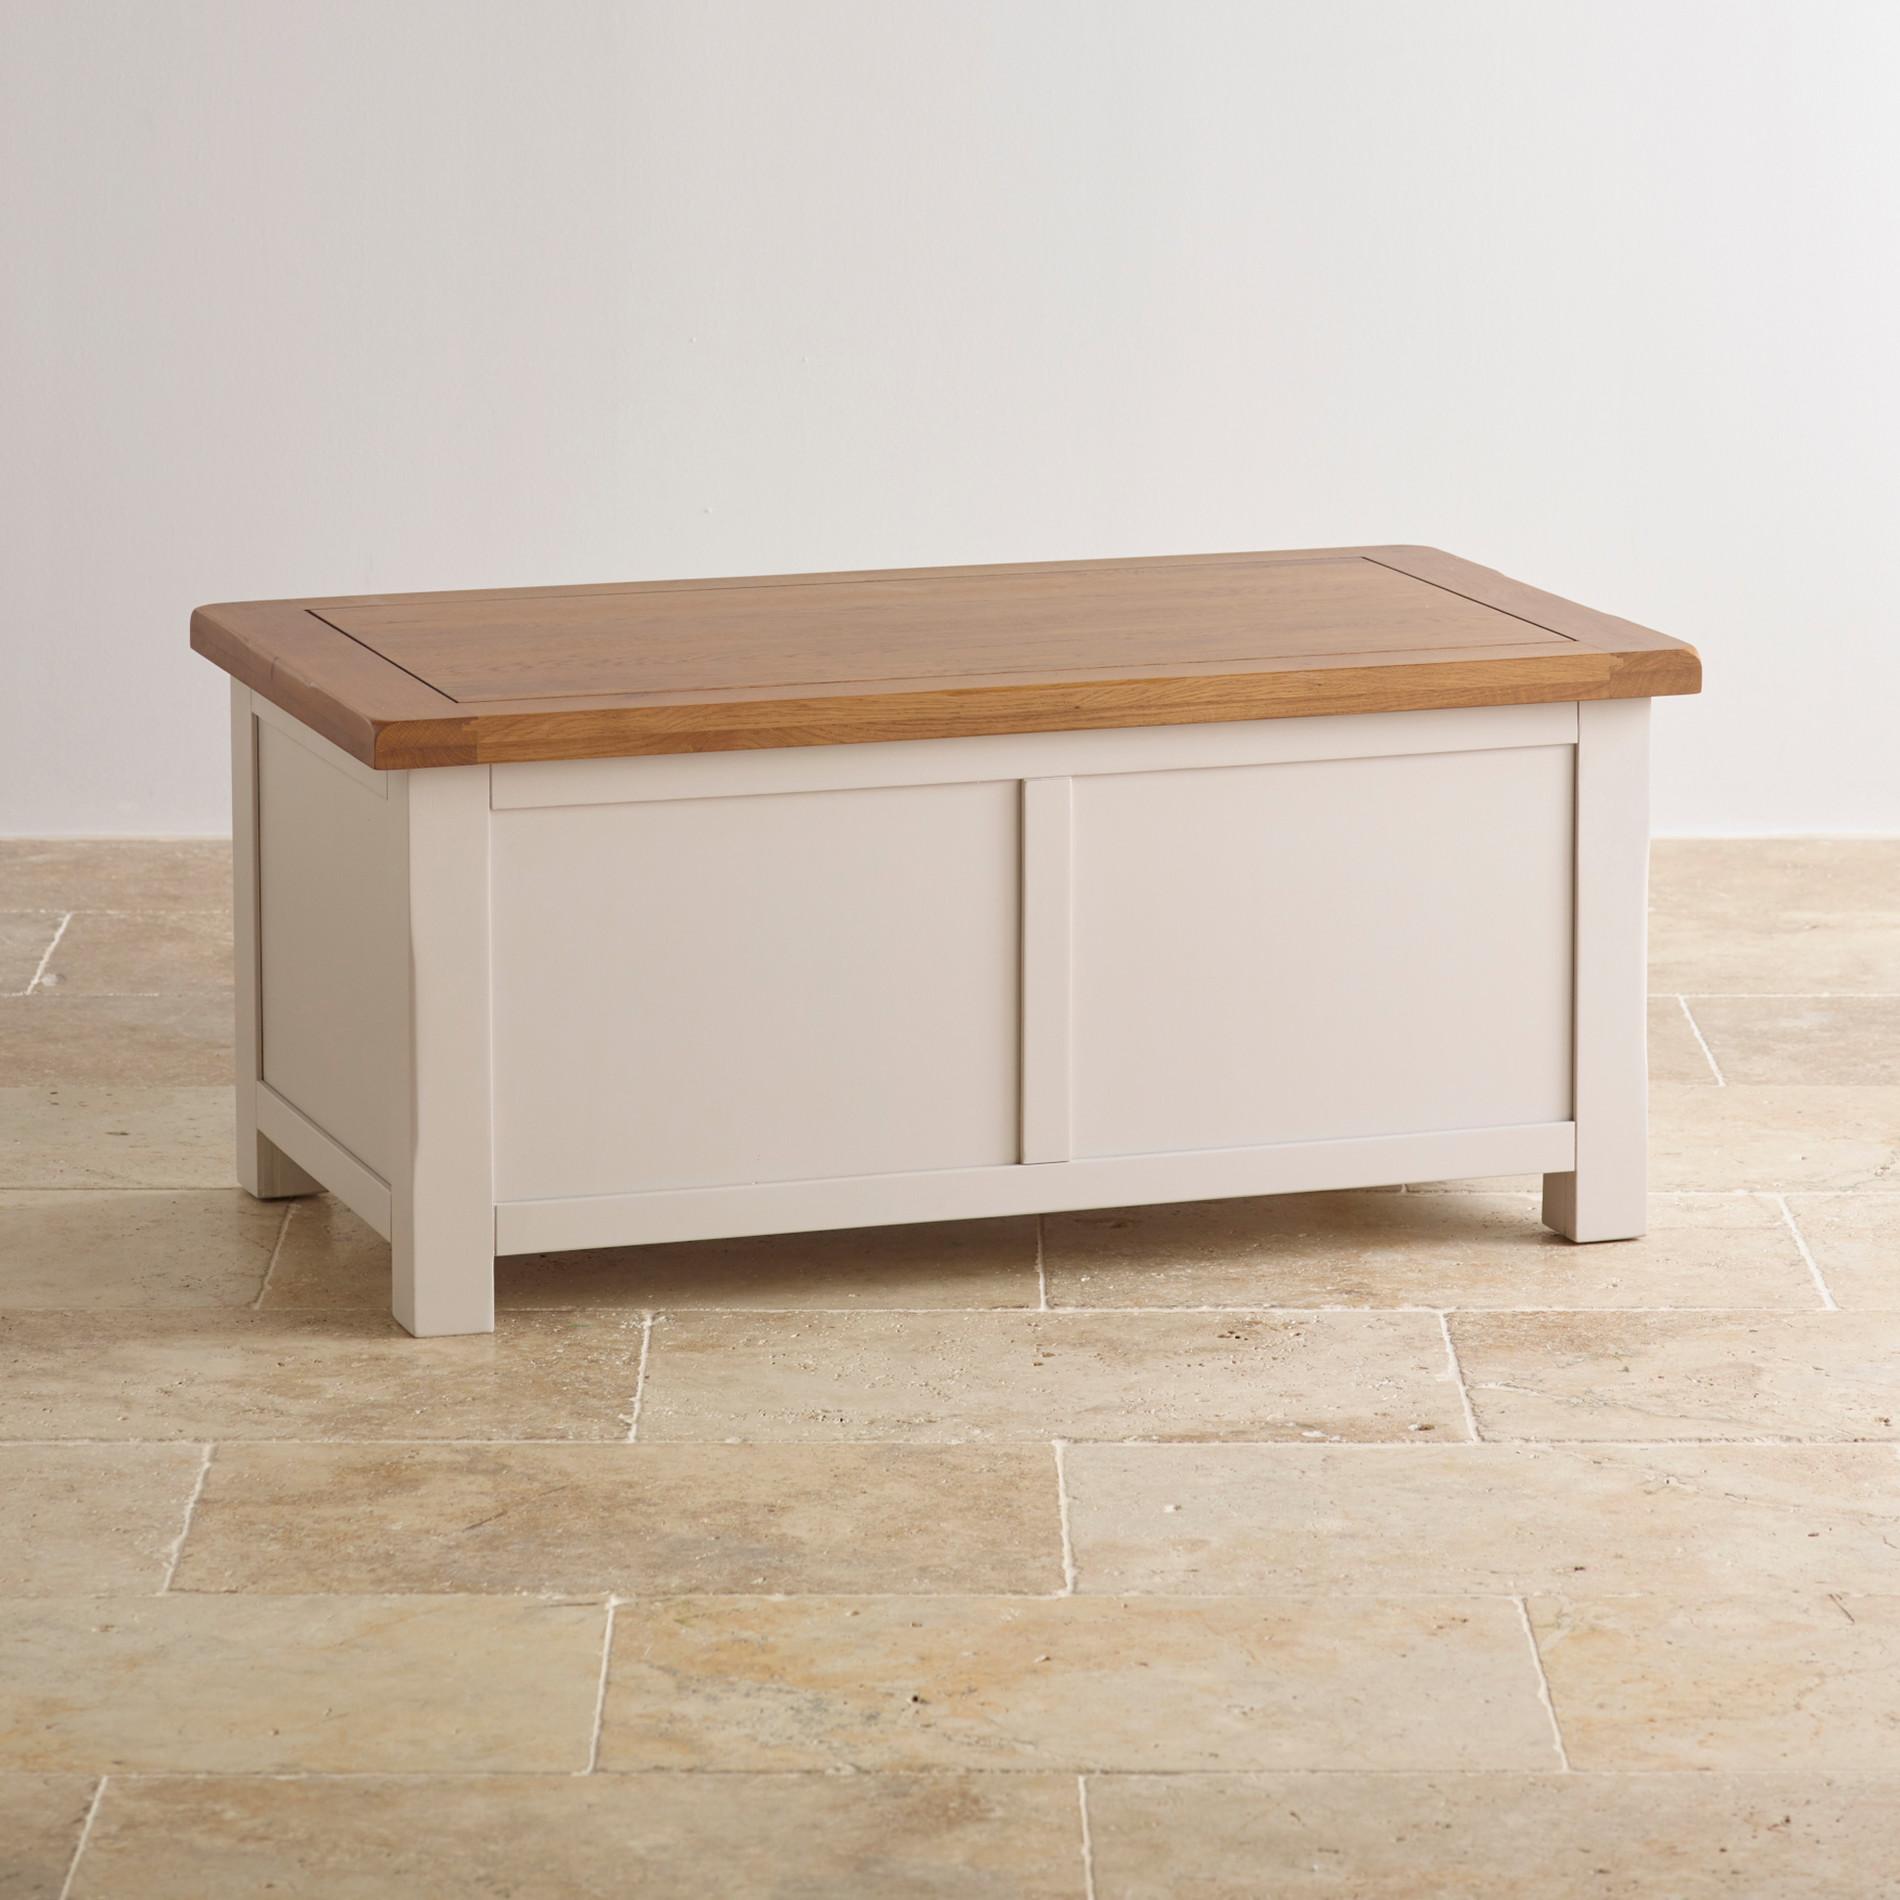 Kemble Painted Blanket Box In Solid Oak Oak Furniture Land